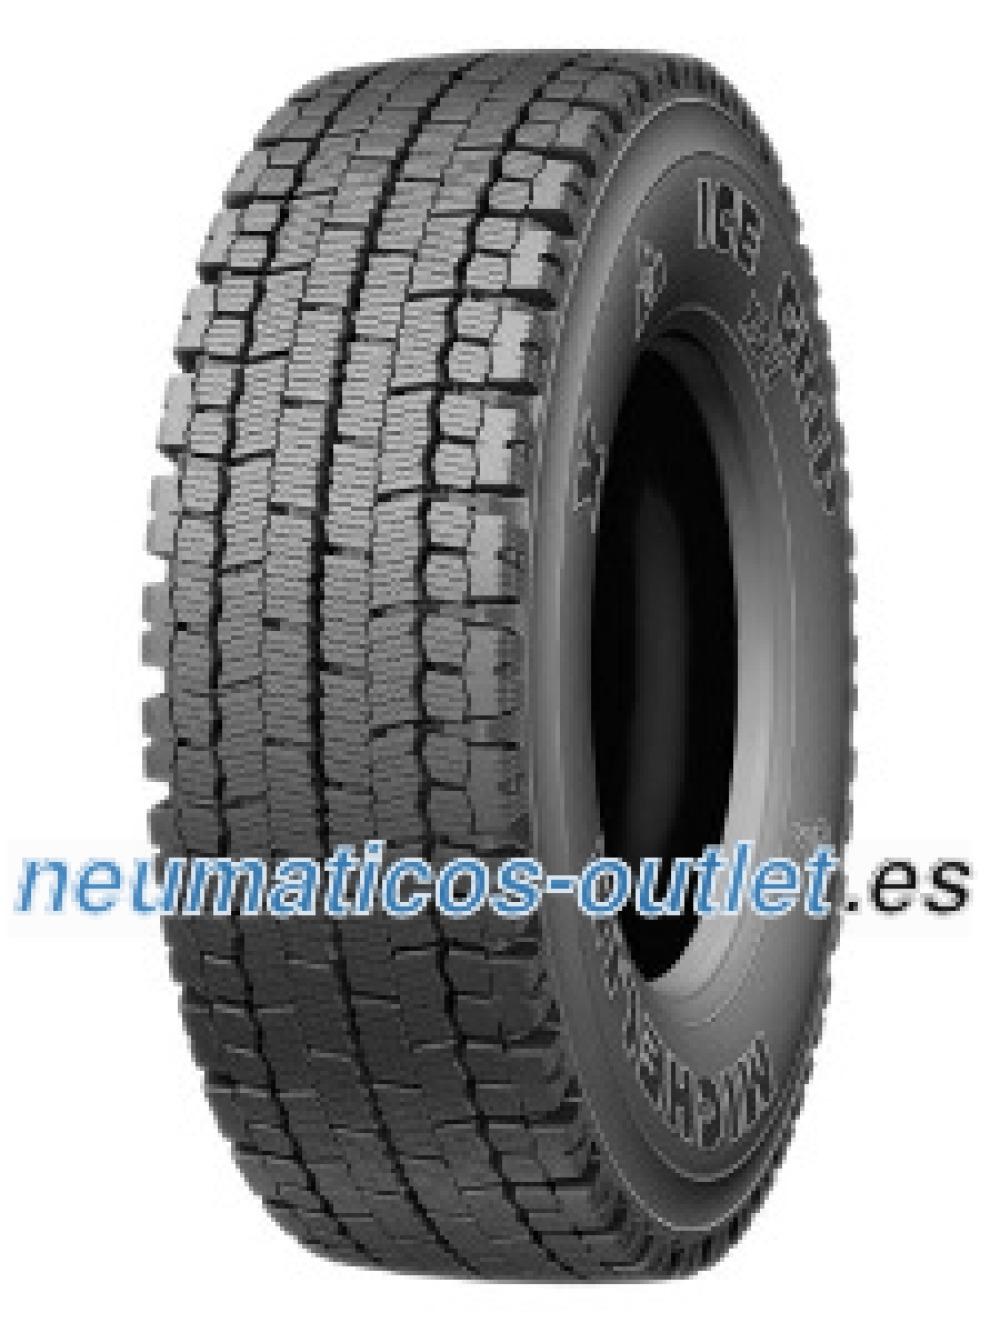 Michelin Remix XDW Ice Grip ( 315/80 R22.5 , recauchutados )